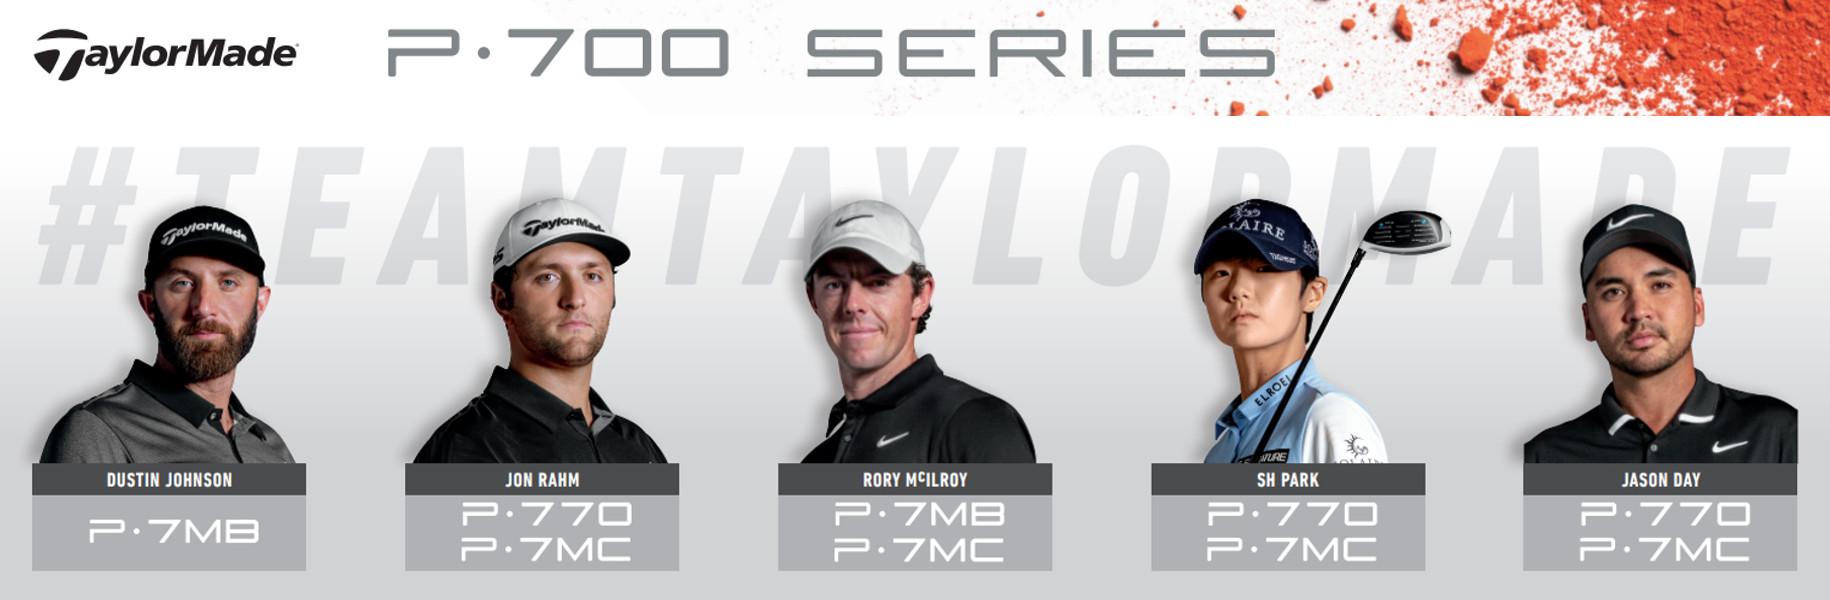 TaylorMade P series Irons